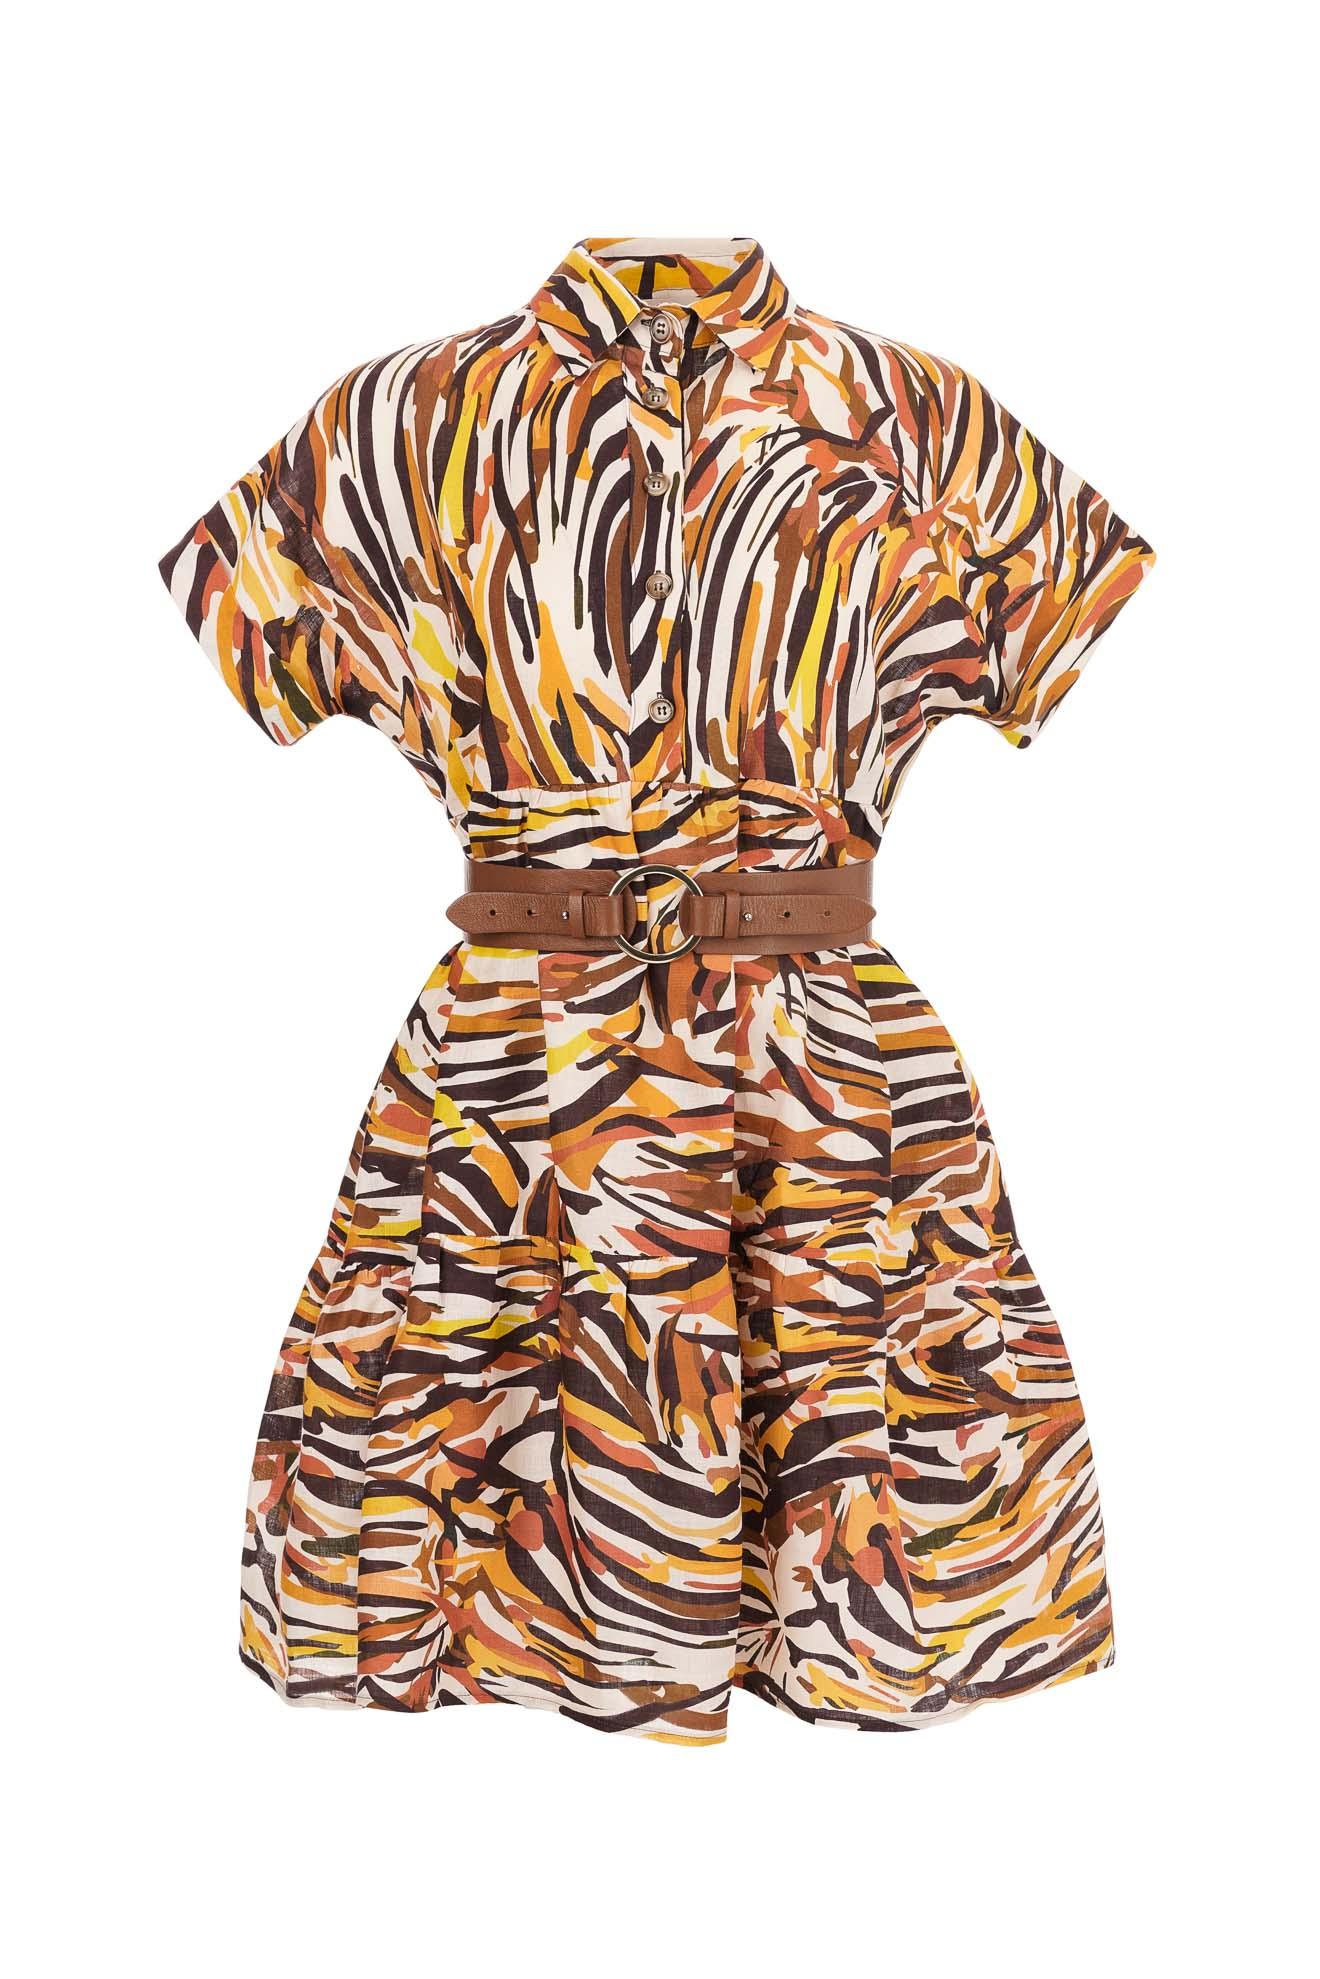 Kalia dress by Denina Martin